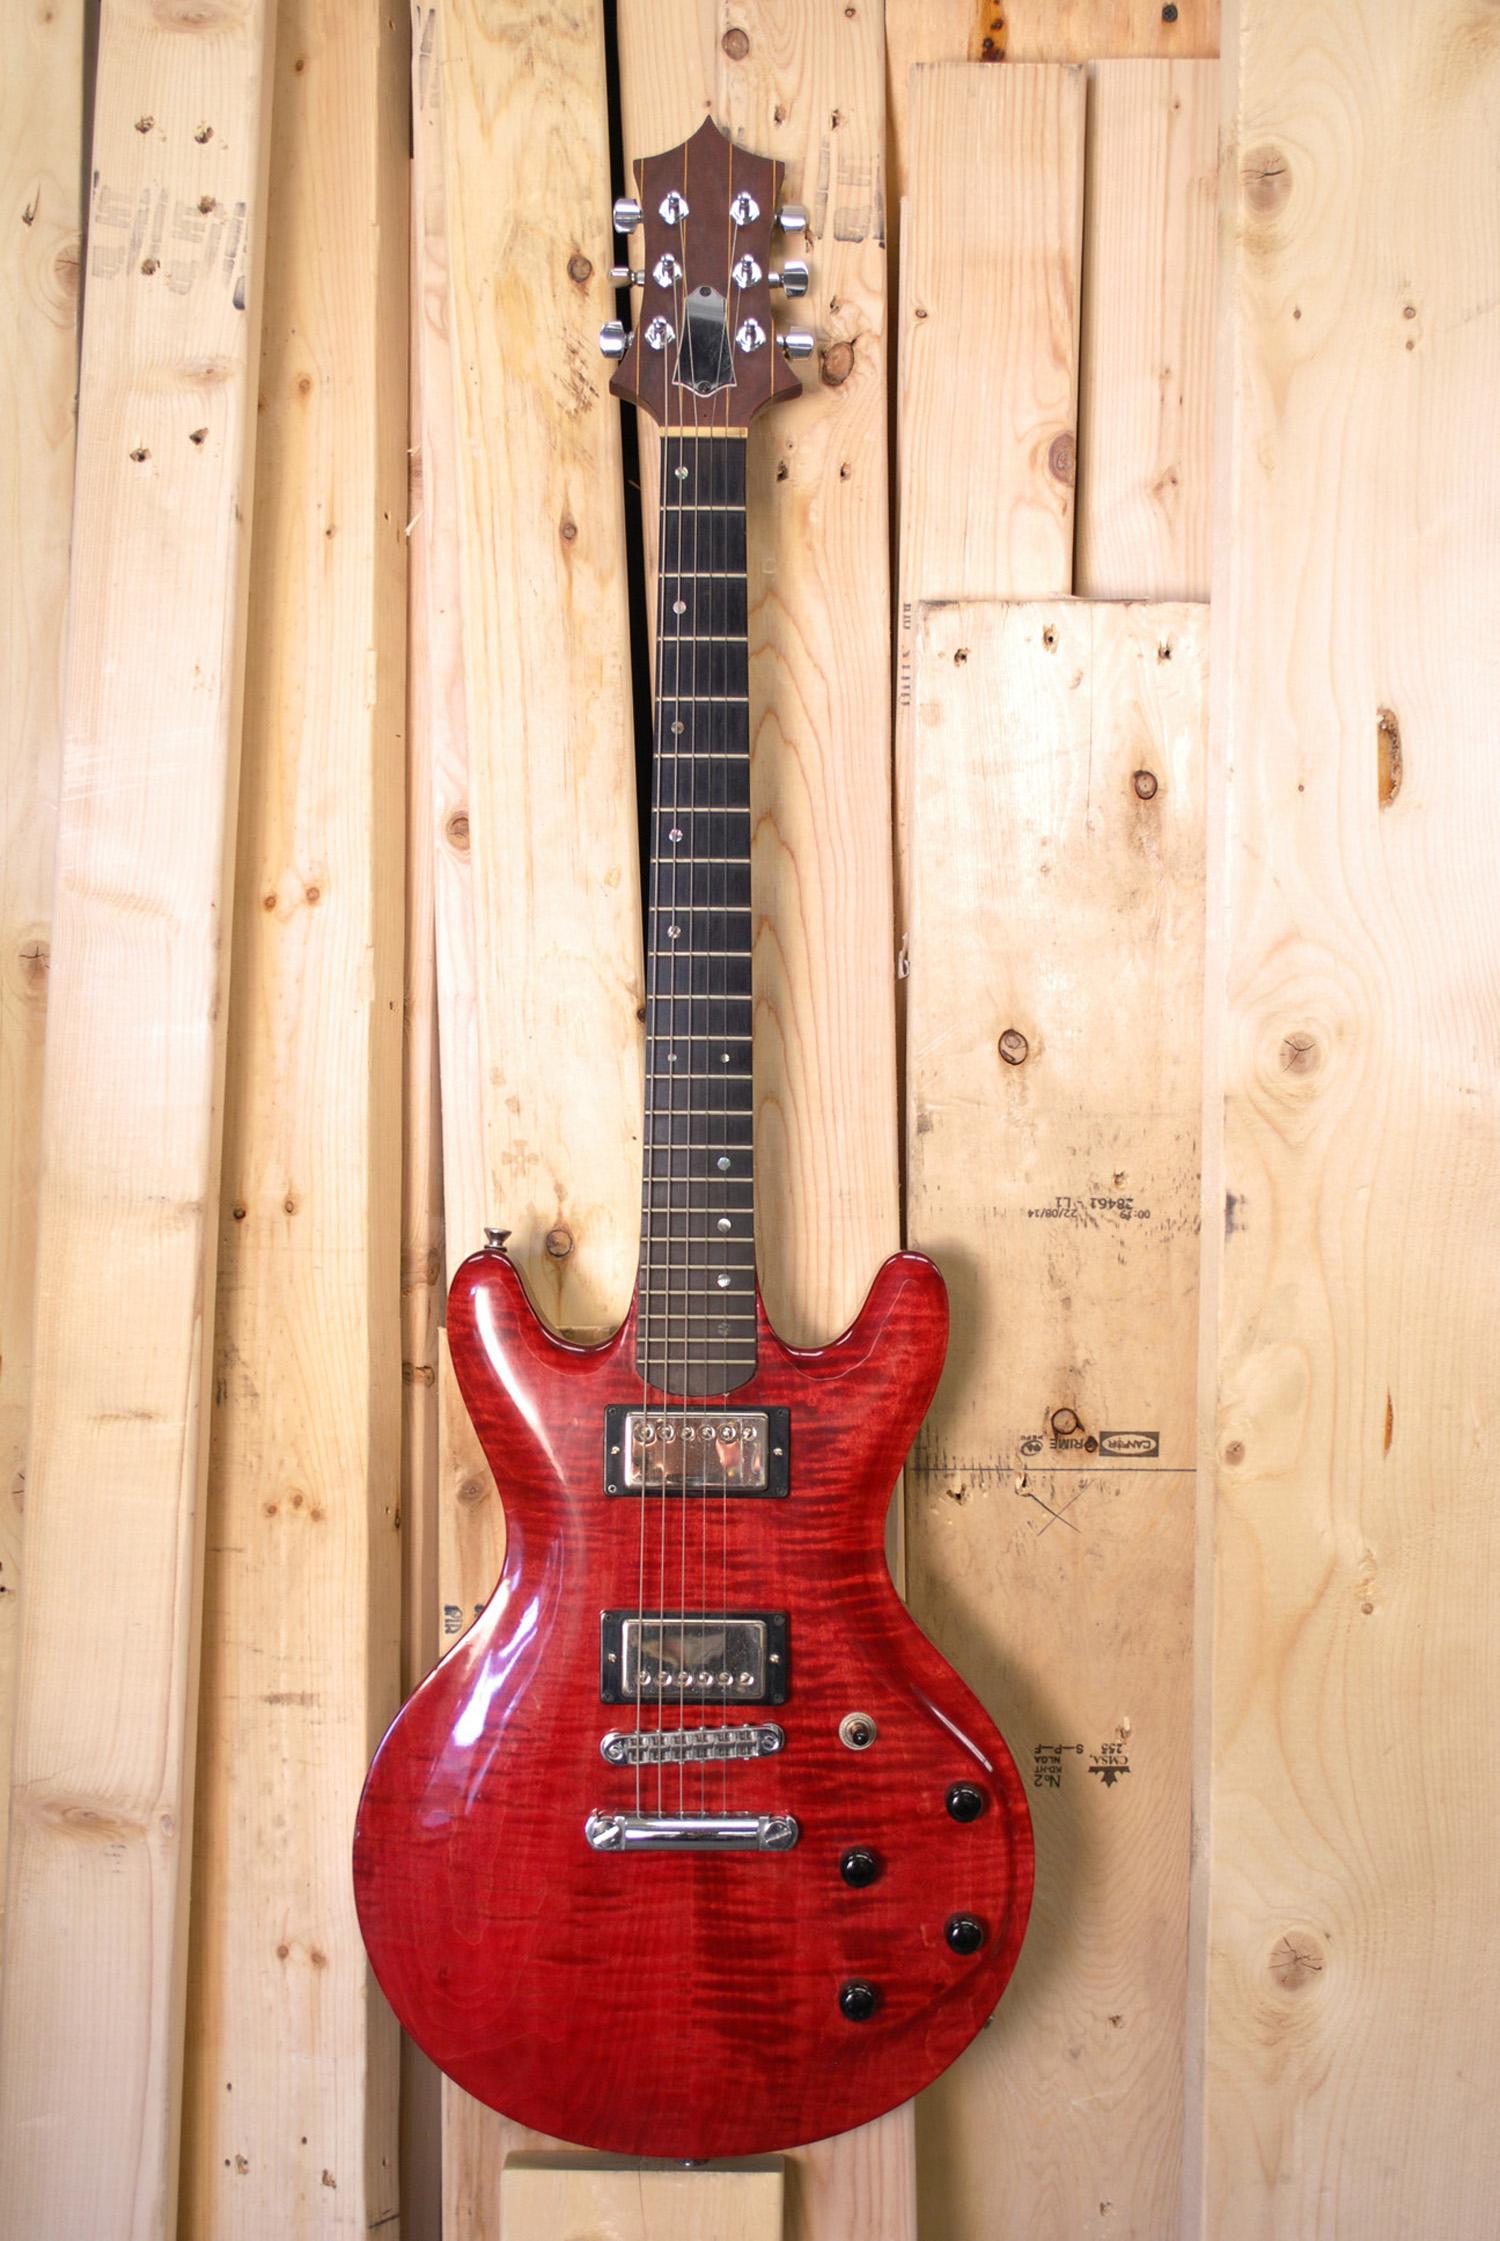 mustguitars-guitar-the one-comp (4).jpg